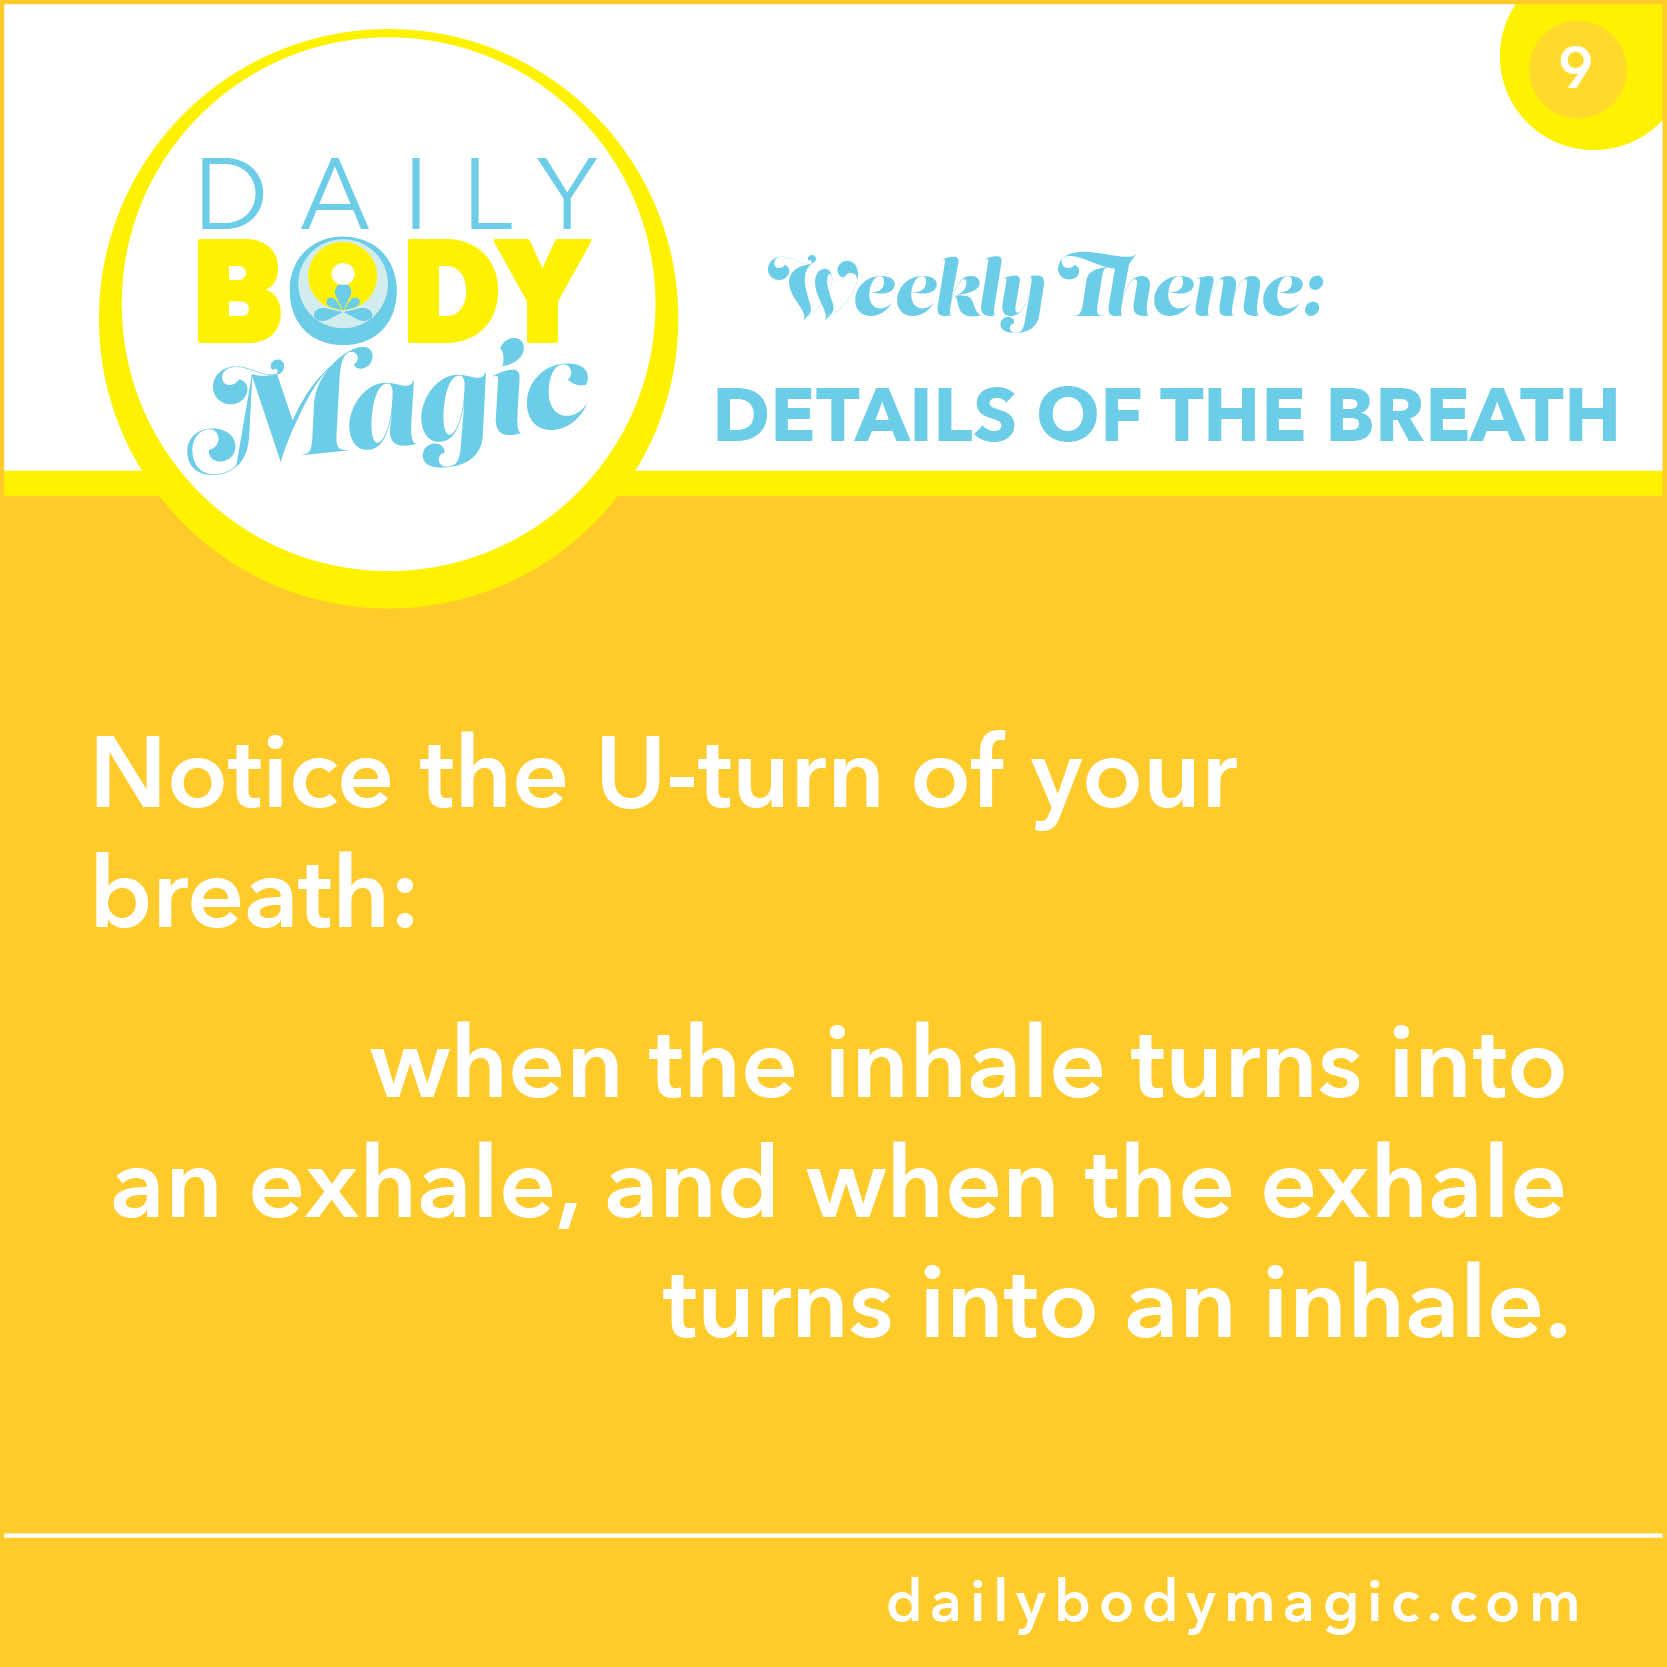 Daily Body Magic 9